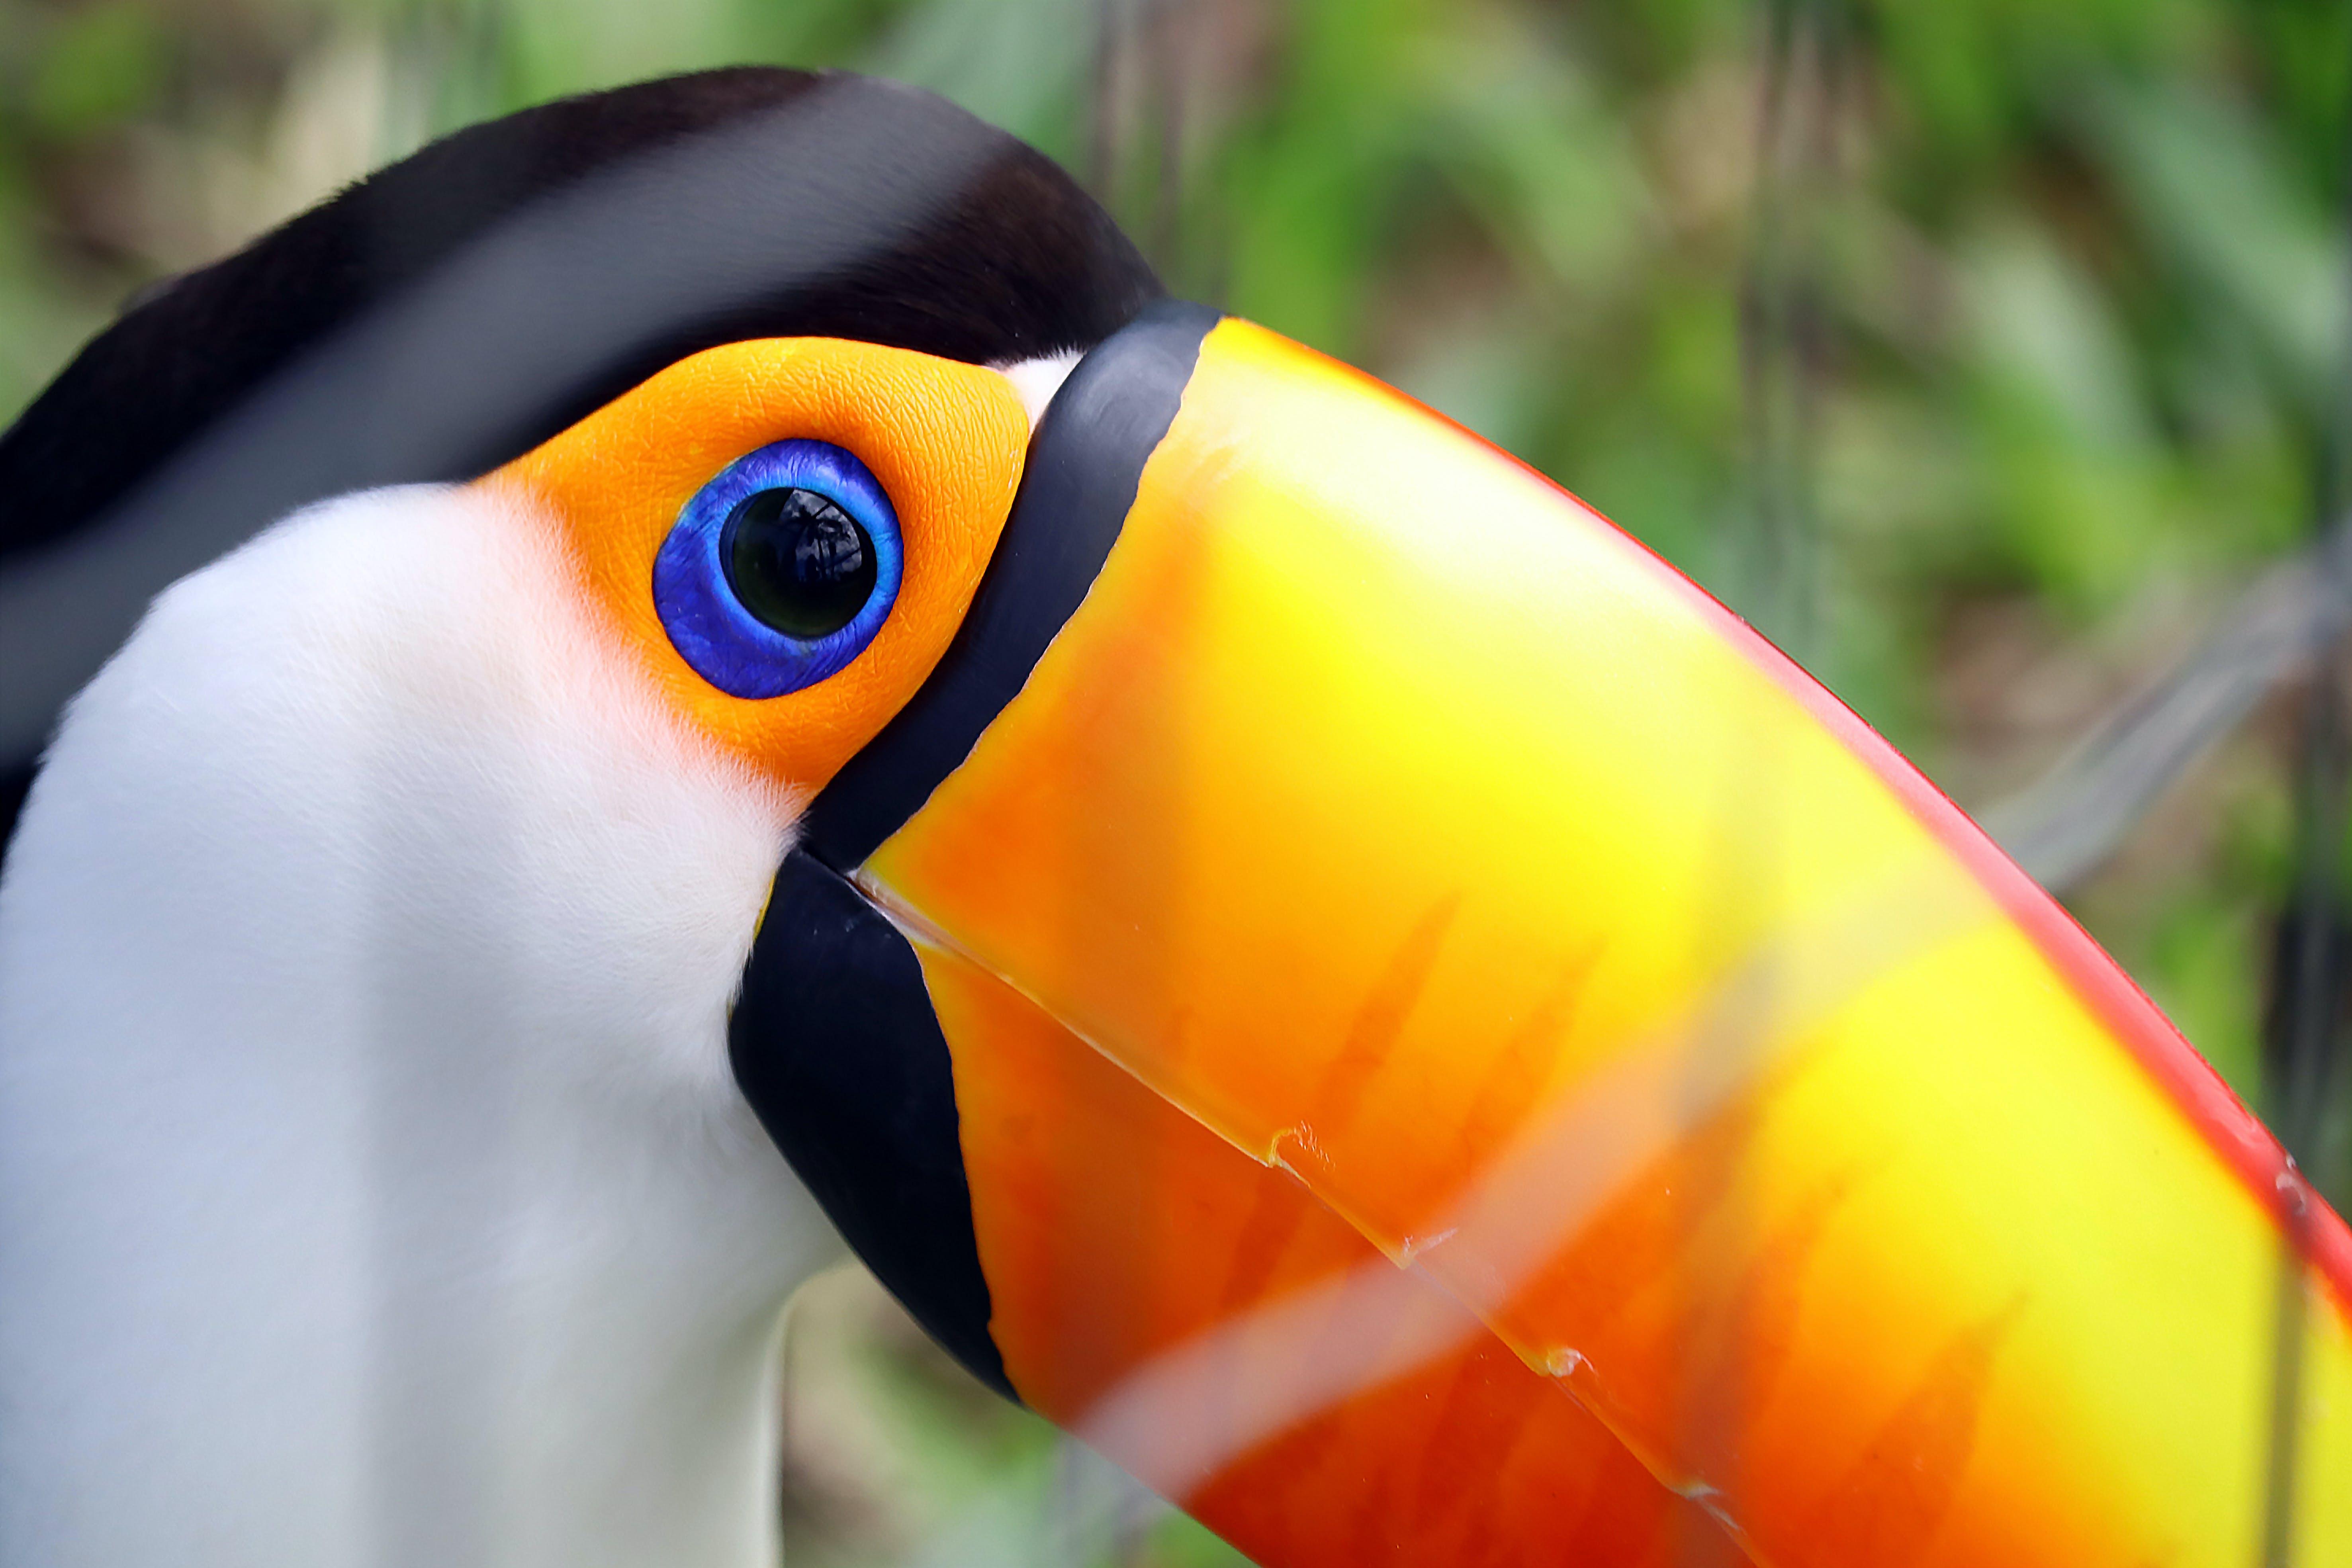 Kostenloses Stock Foto zu vogel, tier, schnabel, kopf